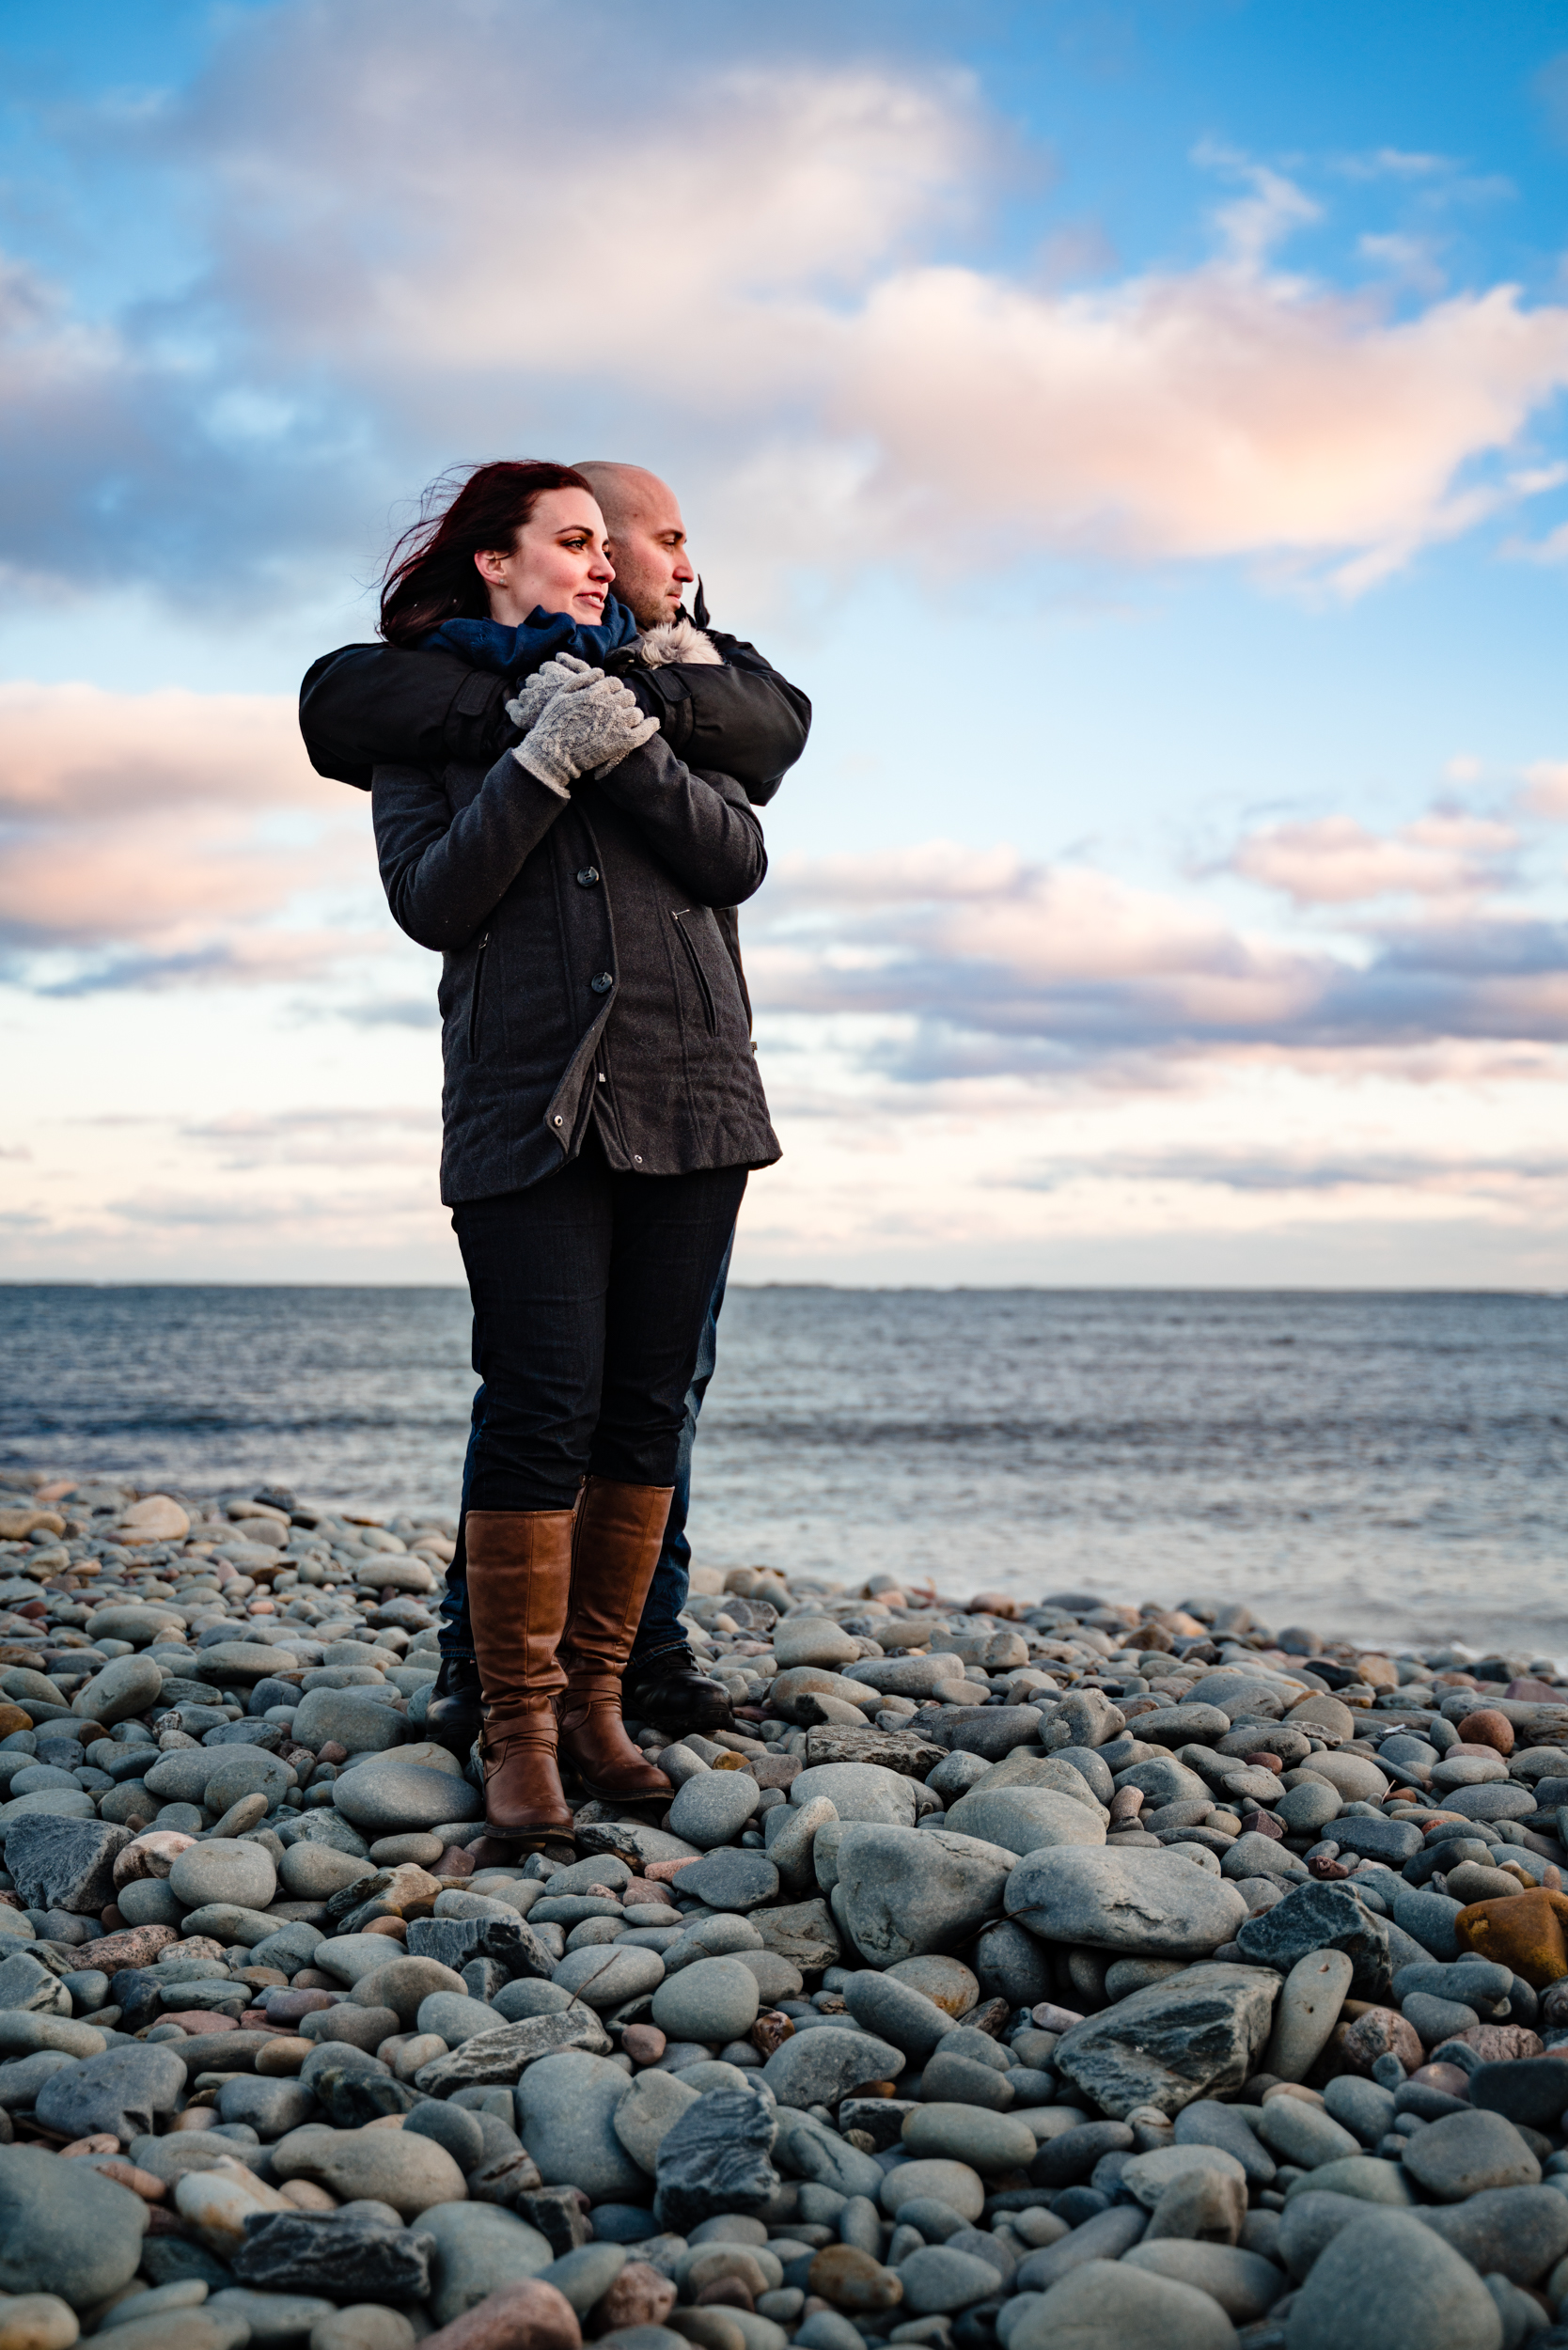 Sarah&Shayne-Halifax-engagement-weddingphotography-weddingphotographers-novascotia (30 of 41).jpg